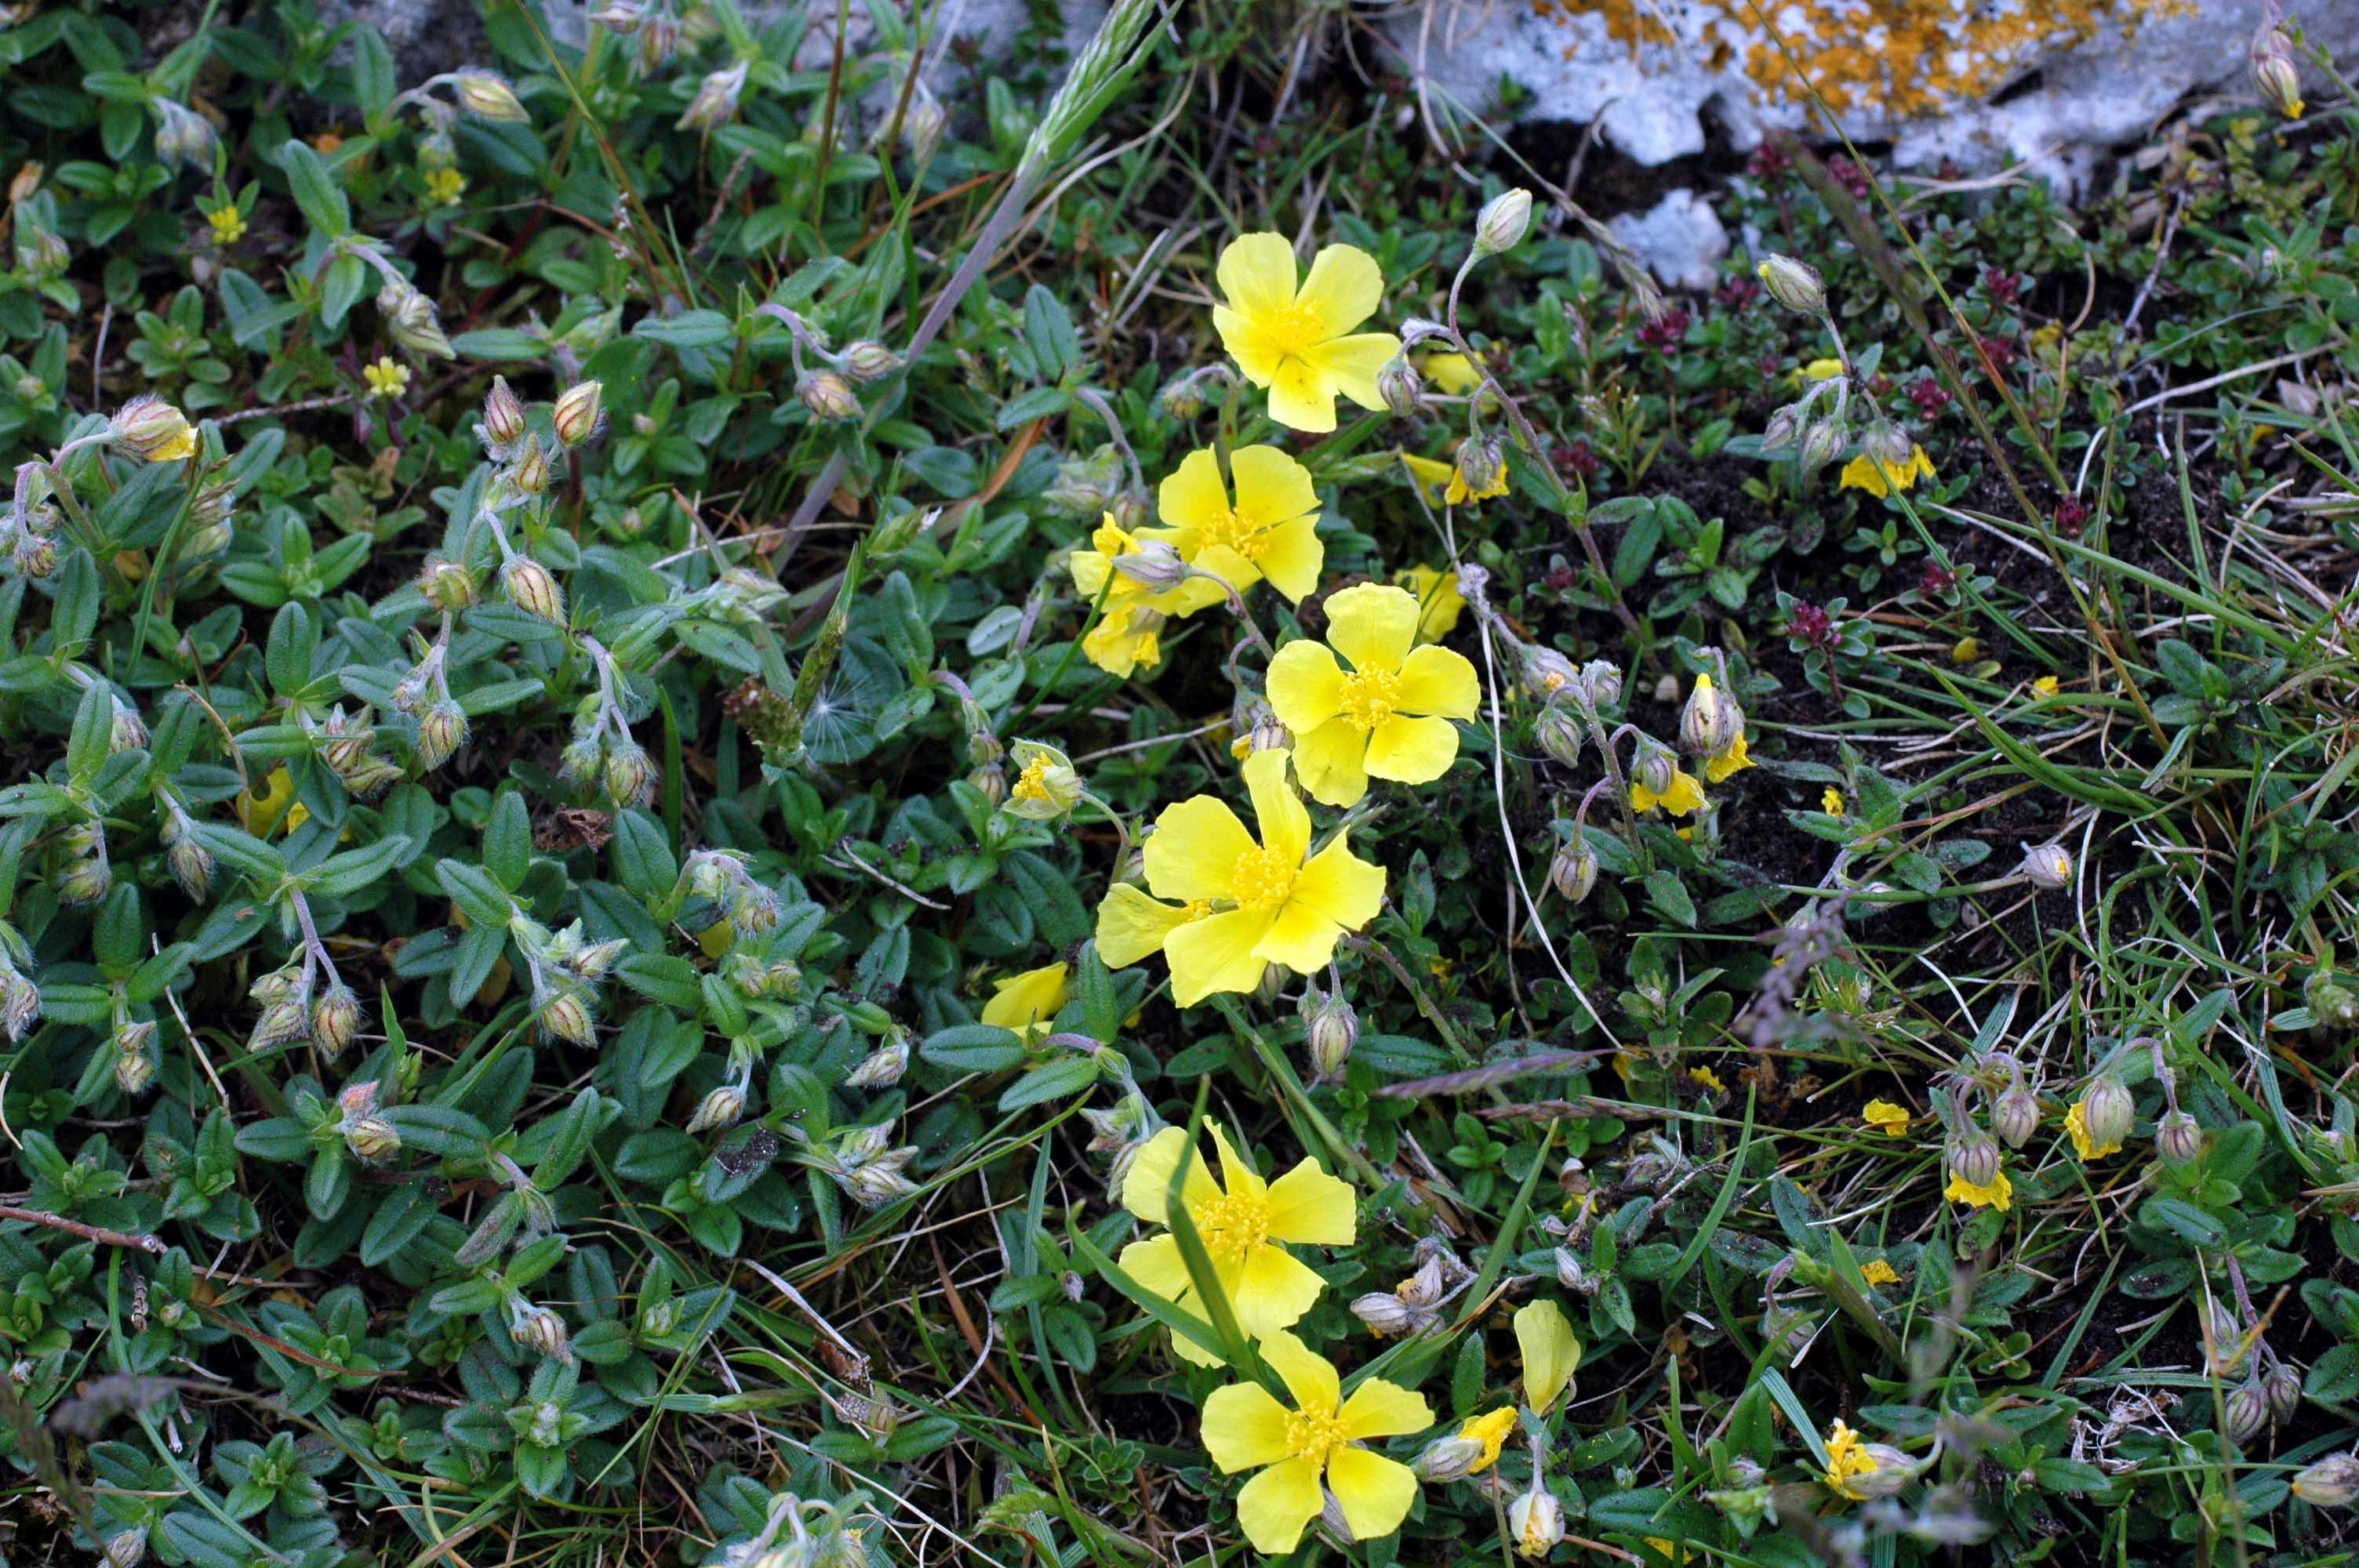 Wildflowers with yellow flowers everyday nature trails common rockrose helianthemum chemaecistus mightylinksfo